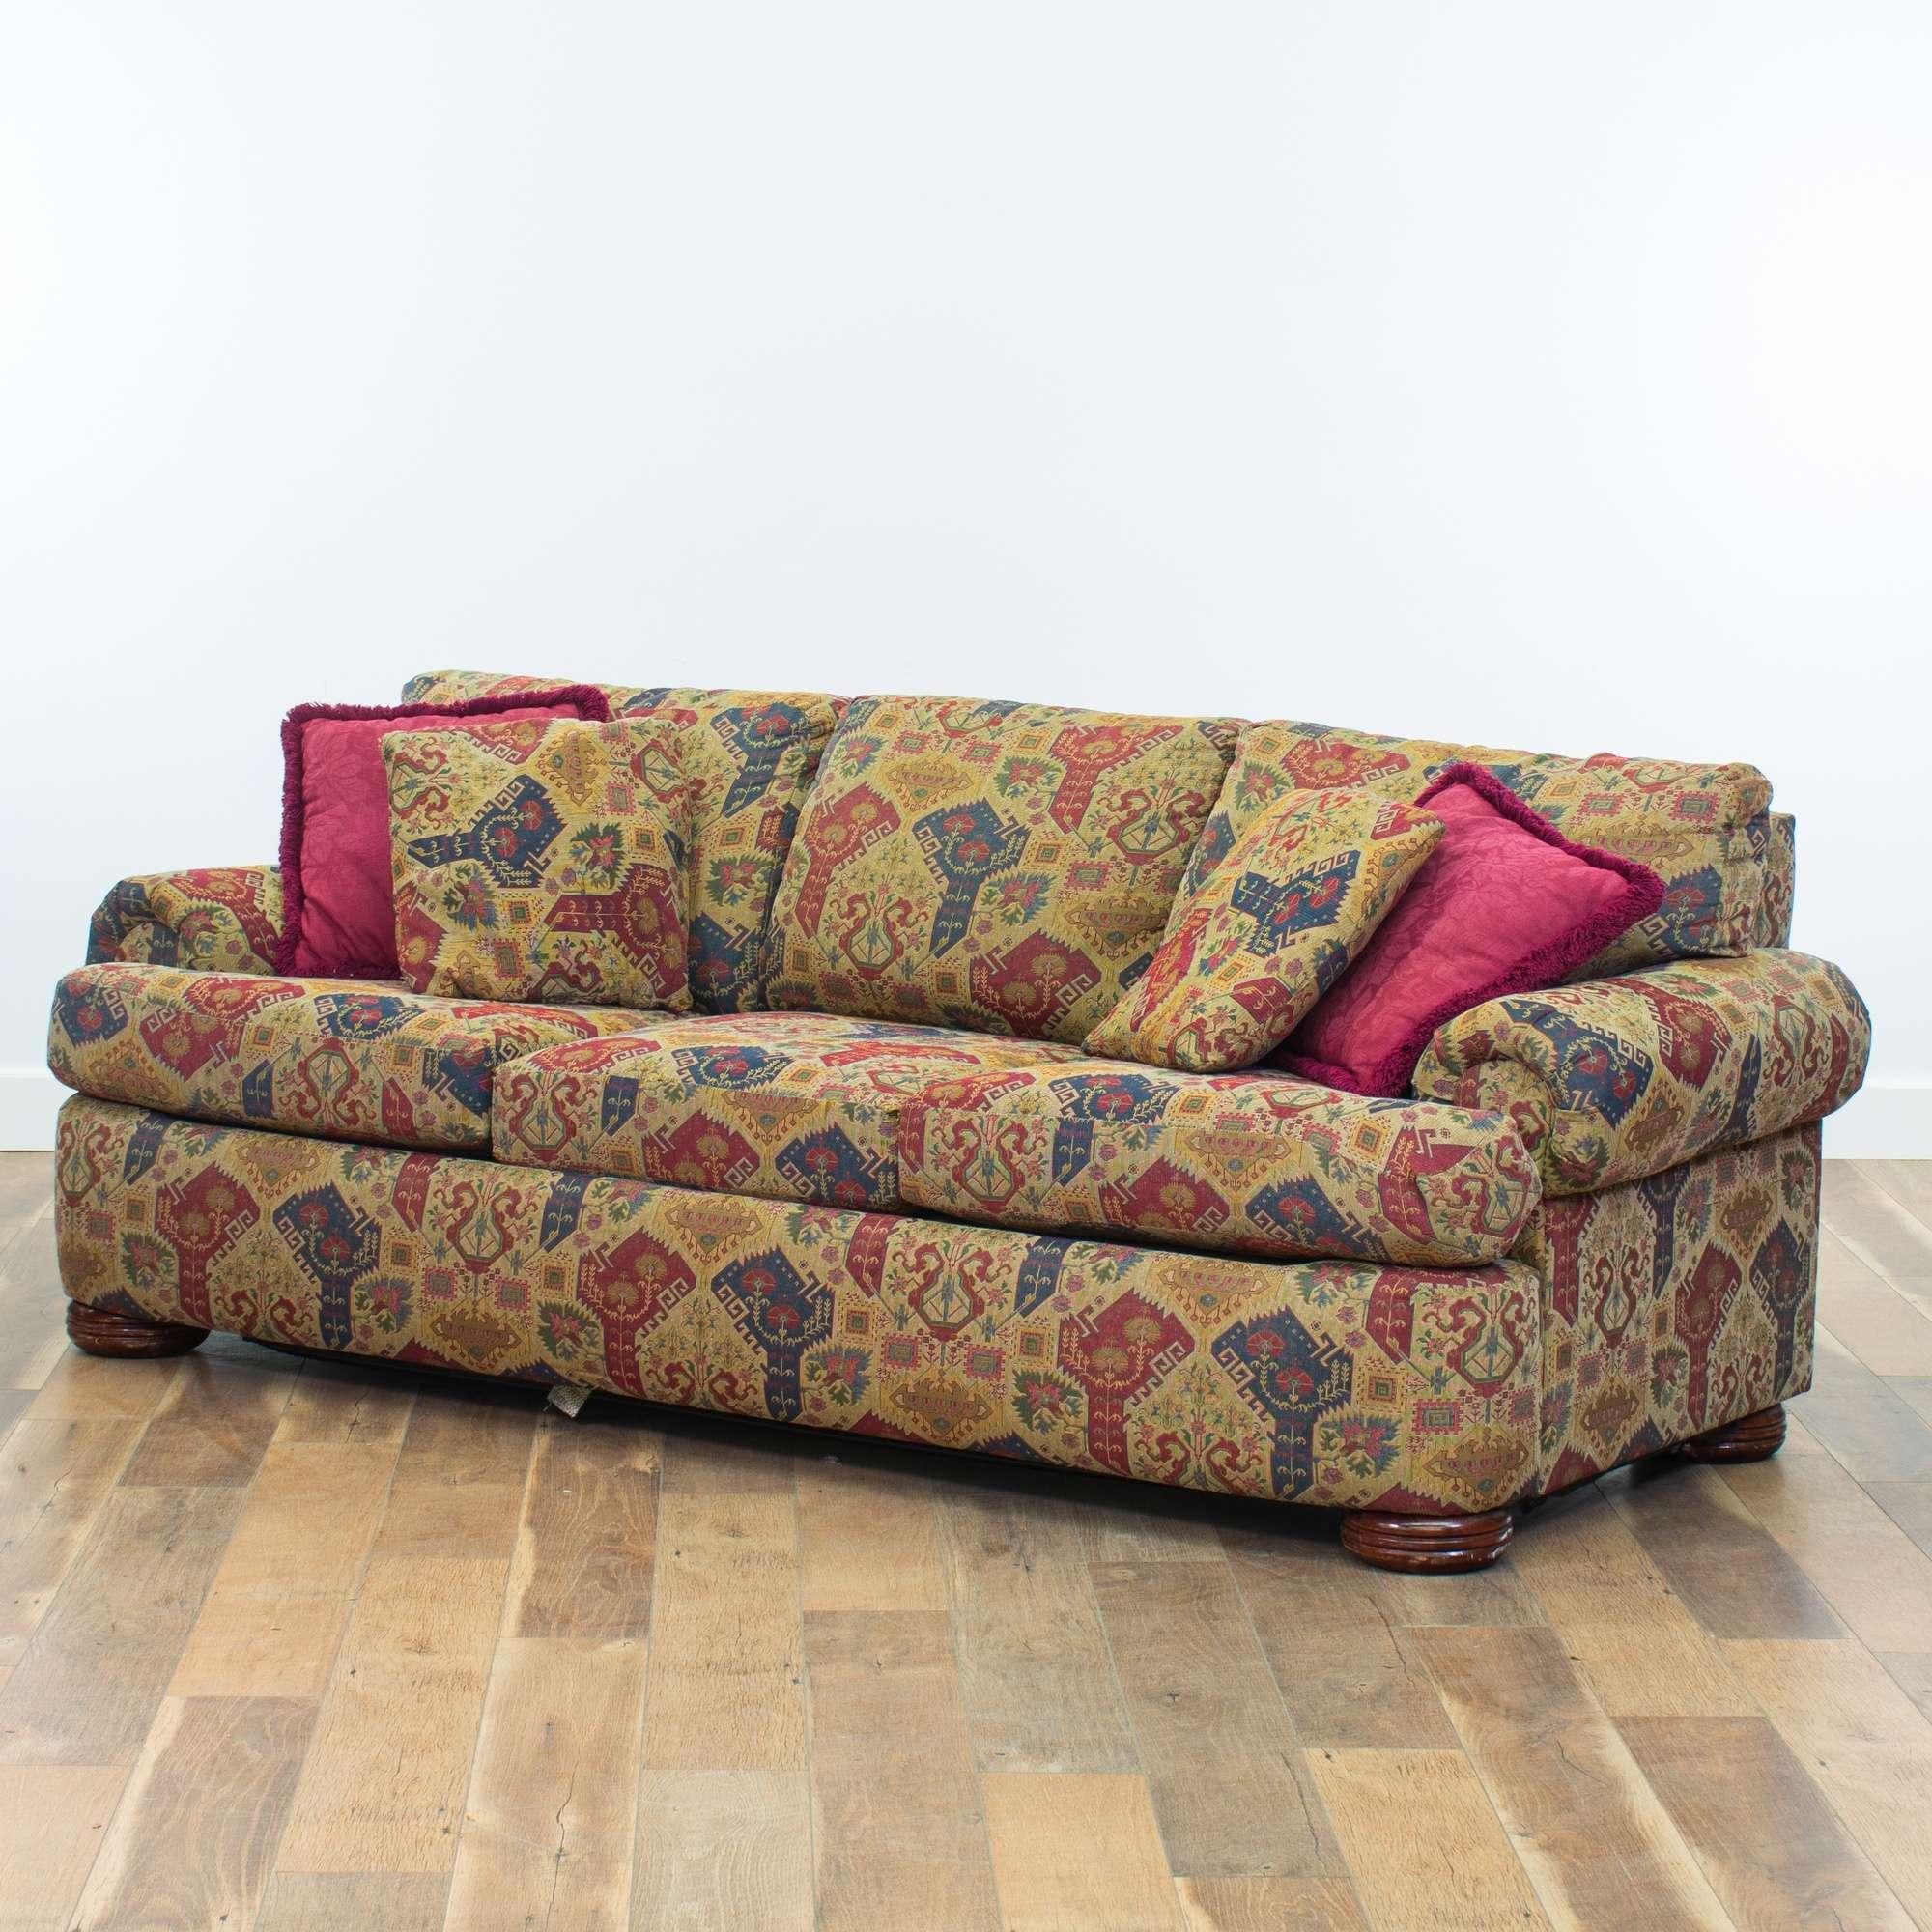 Lane Mid Century Modern Queen Size Sleeper Sofa | Loveseat ...